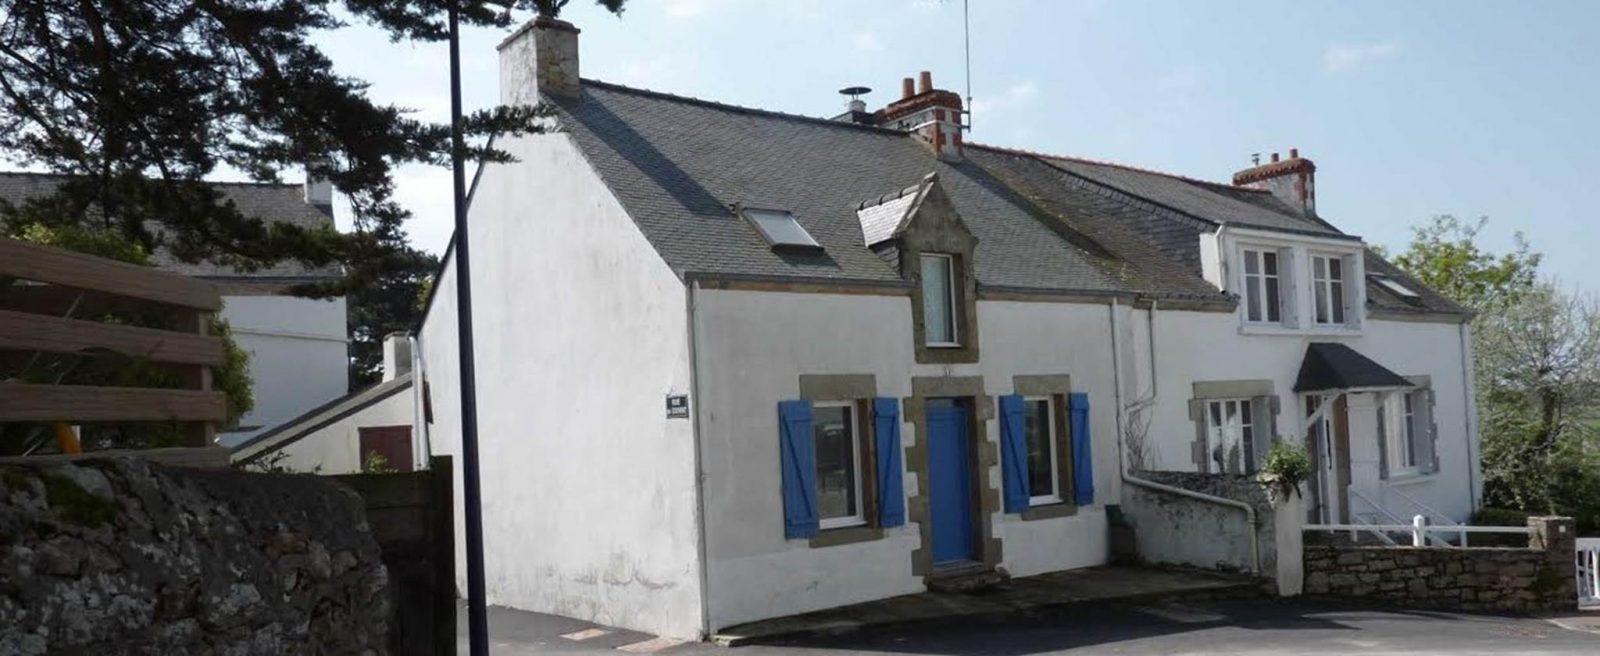 Le Duigou-Tourisme Arc Sud Bretagne